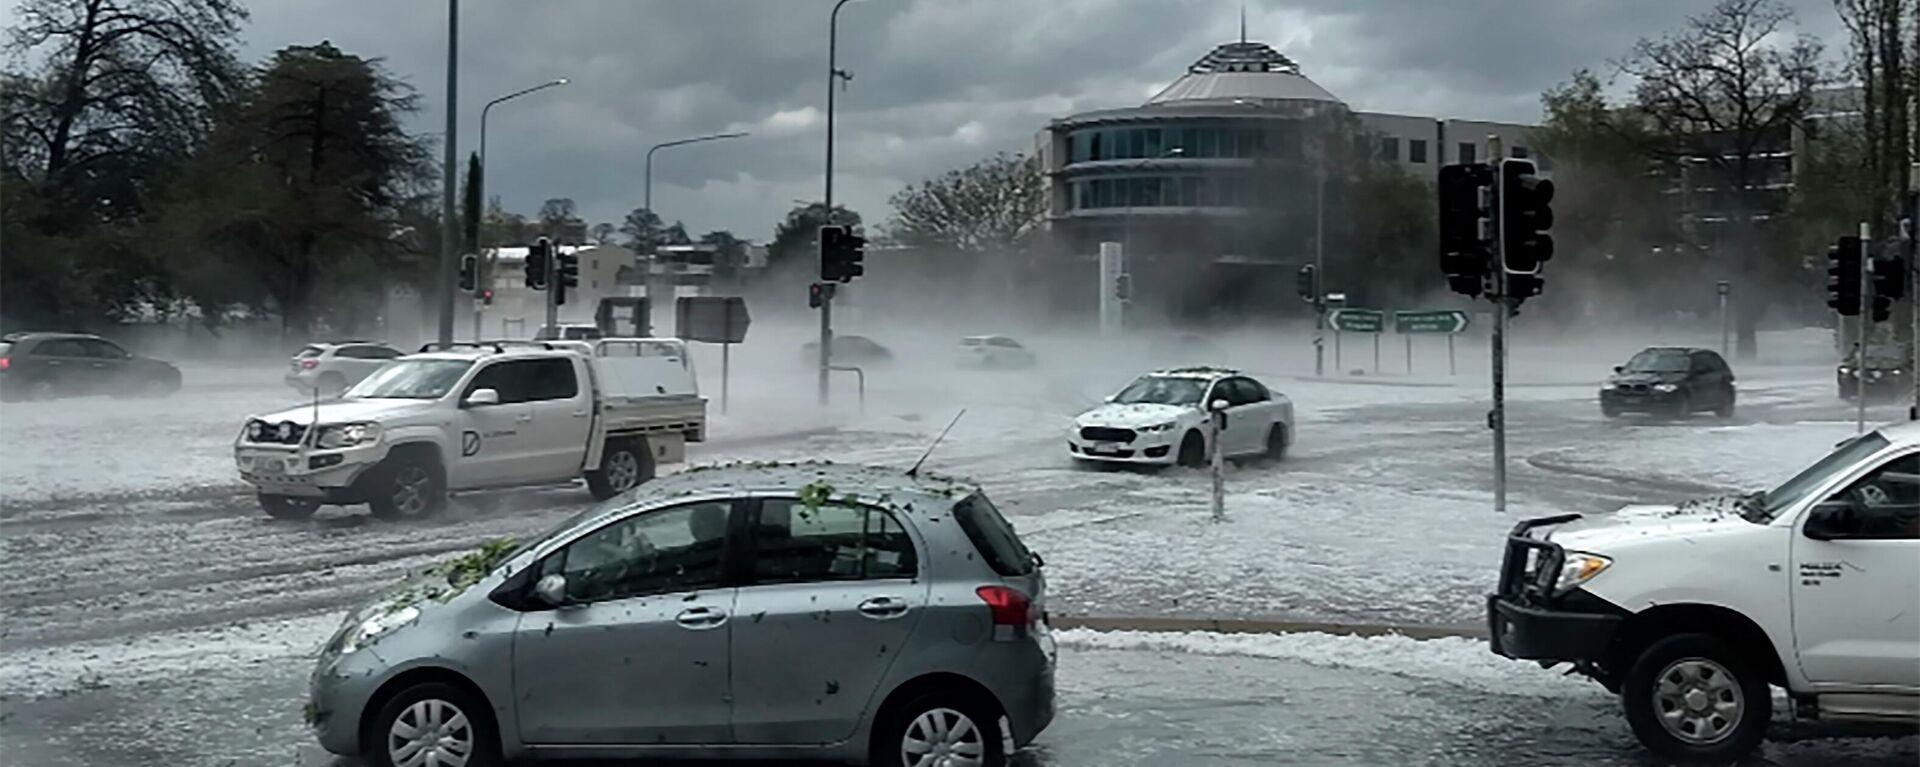 Regenfälle in Australien - SNA, 1920, 13.12.2020